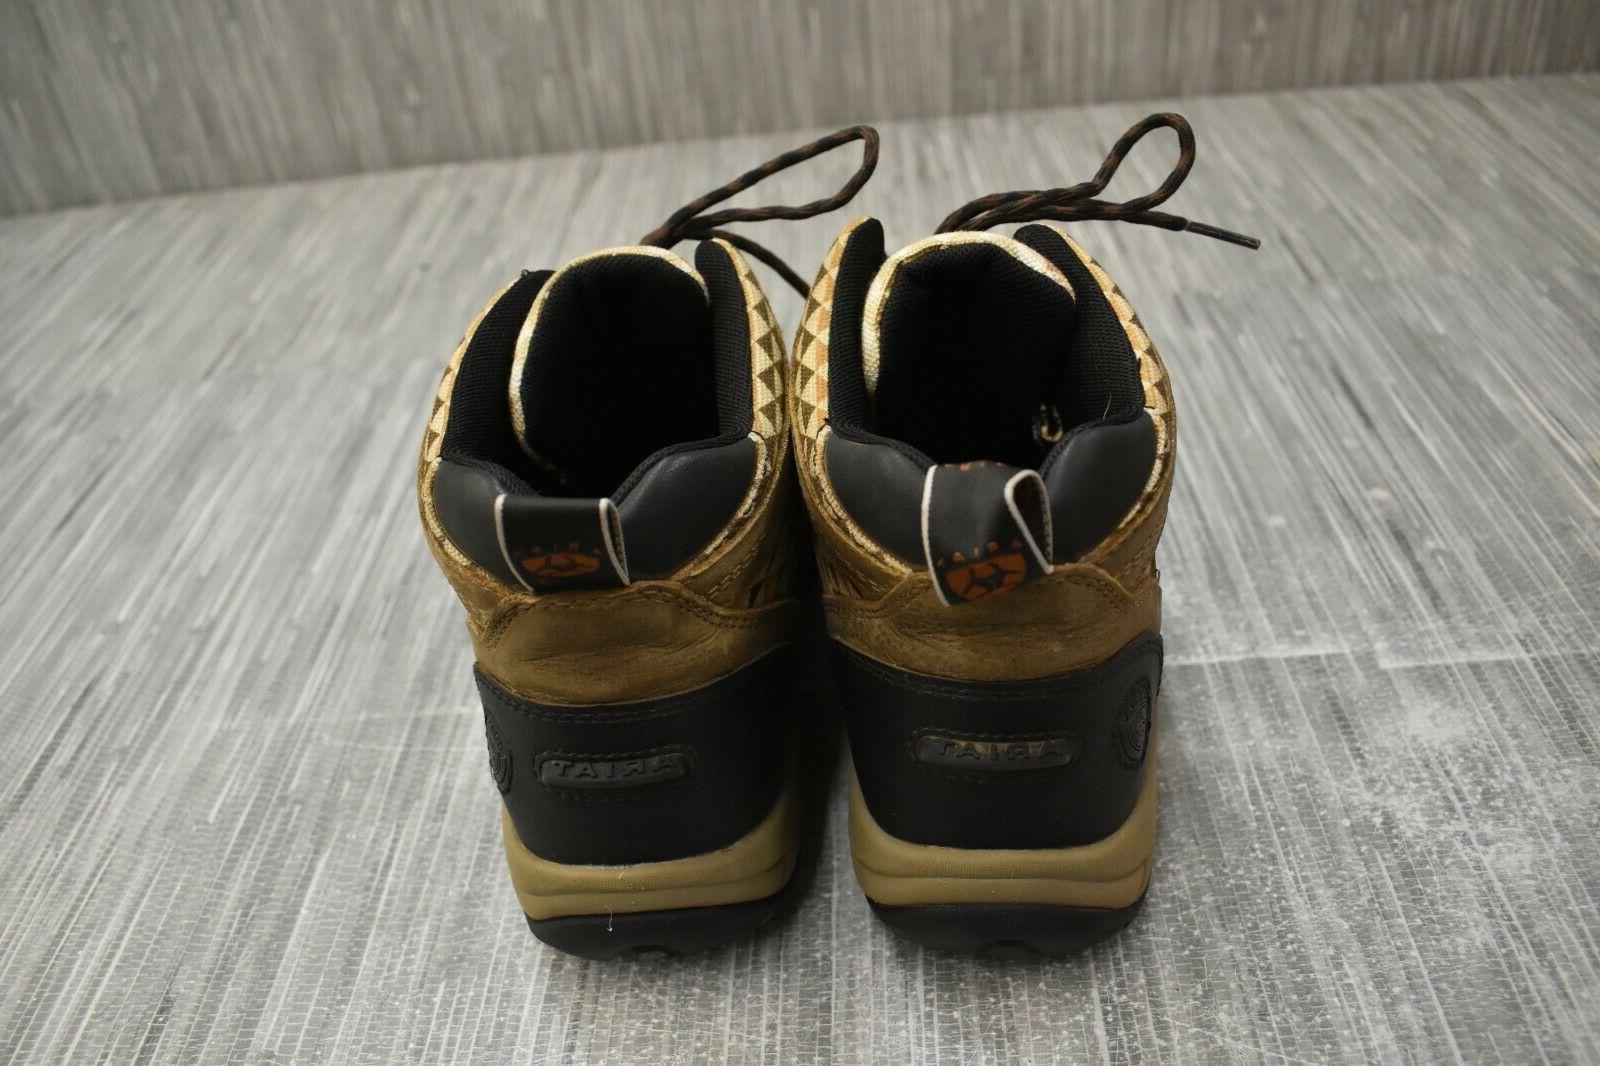 Ariat Terrain 10033925 Hiking Boots, Women's B,